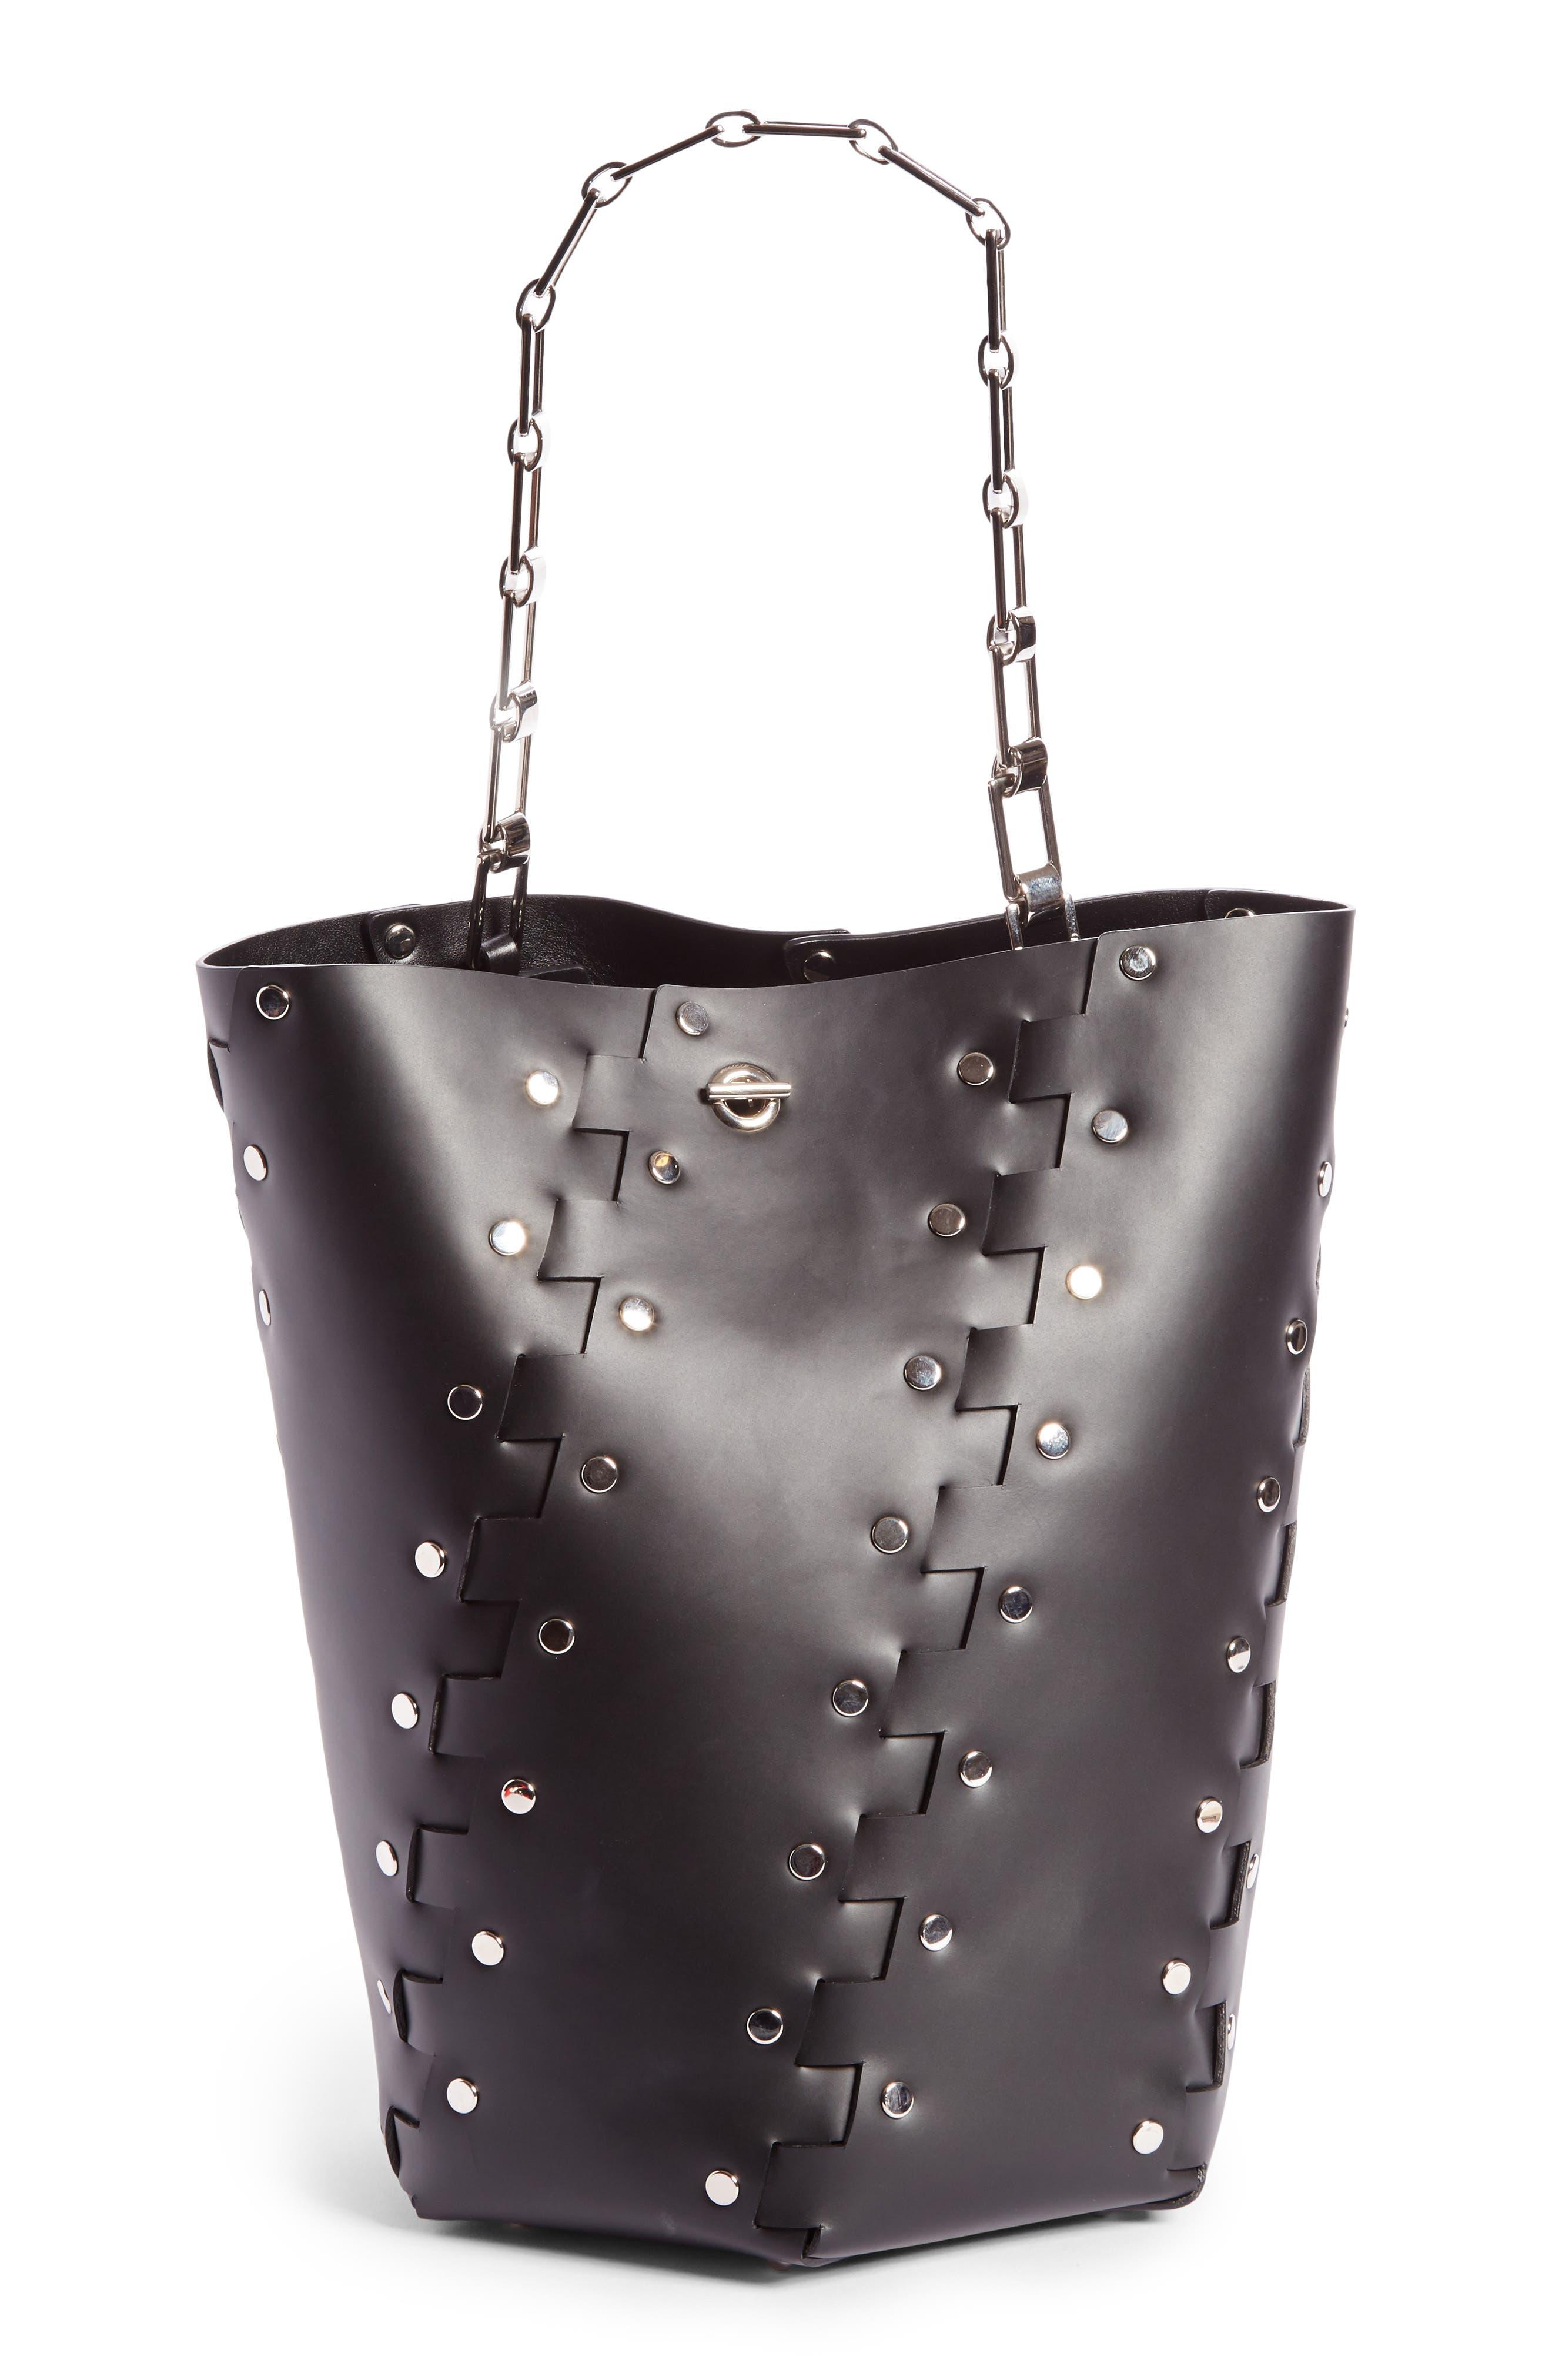 Medium Hex Studded Leather Bucket Bag,                             Main thumbnail 1, color,                             001